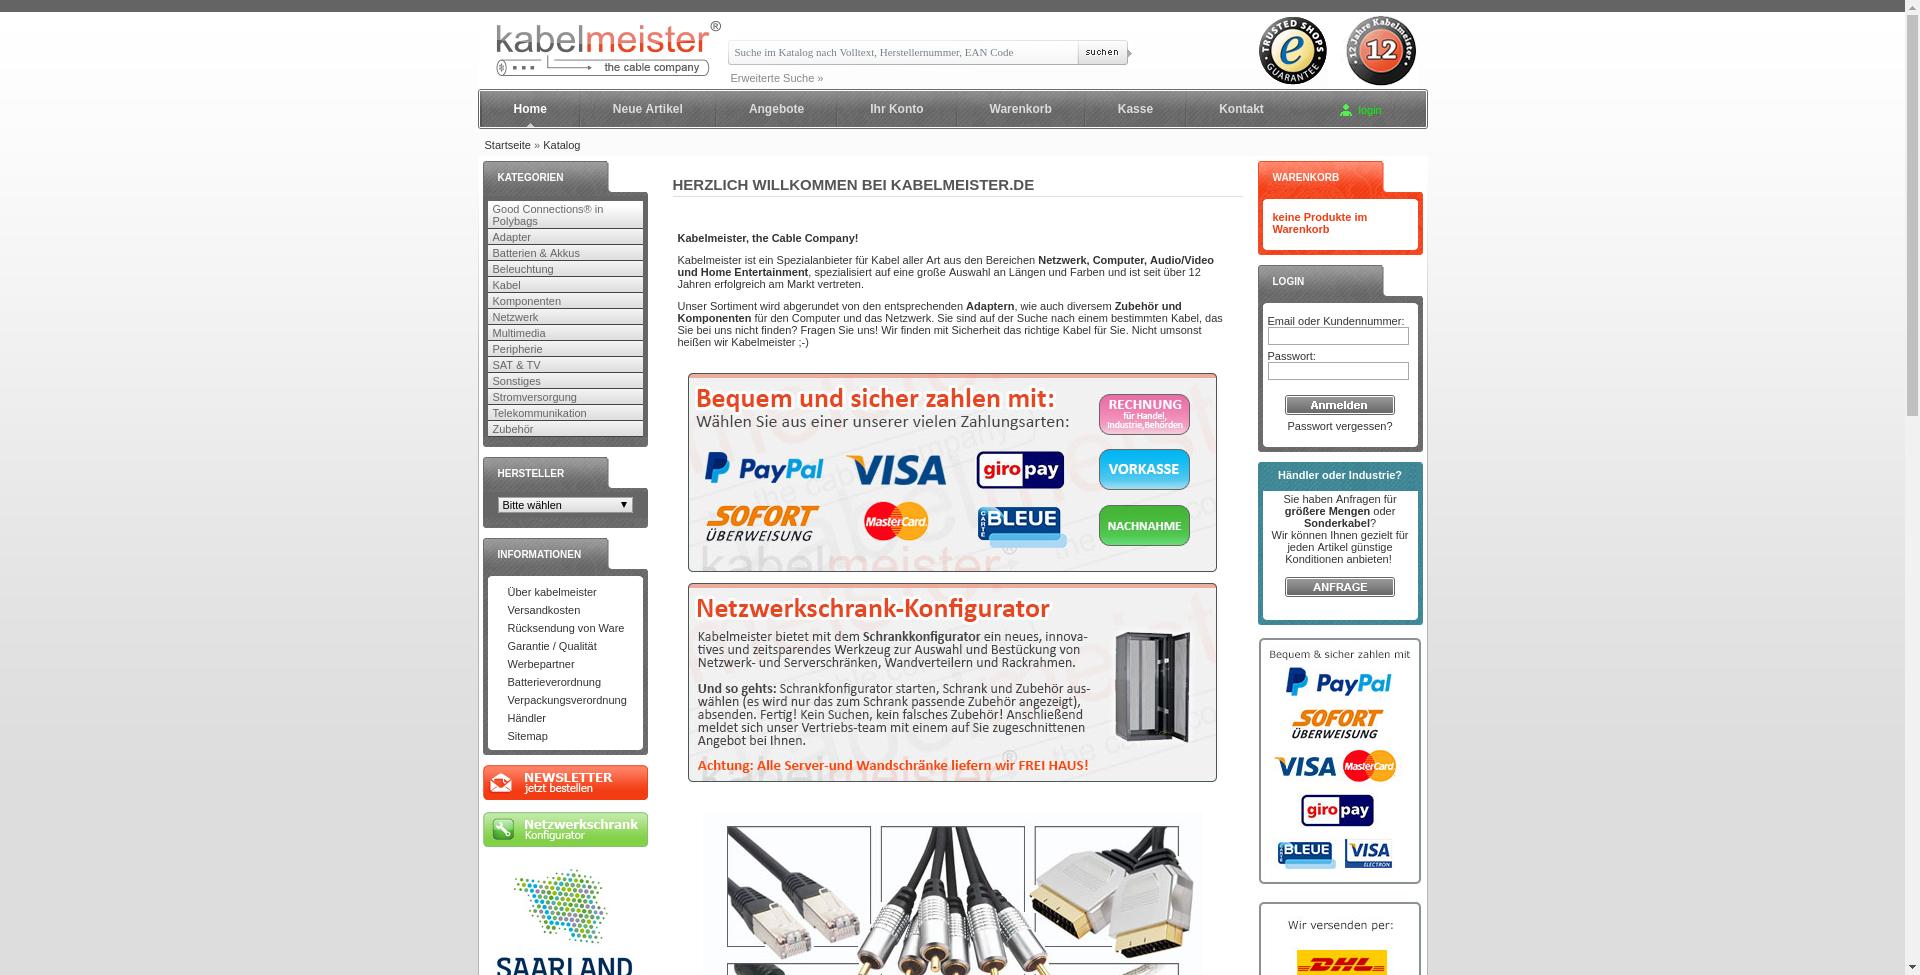 Kabelmeister